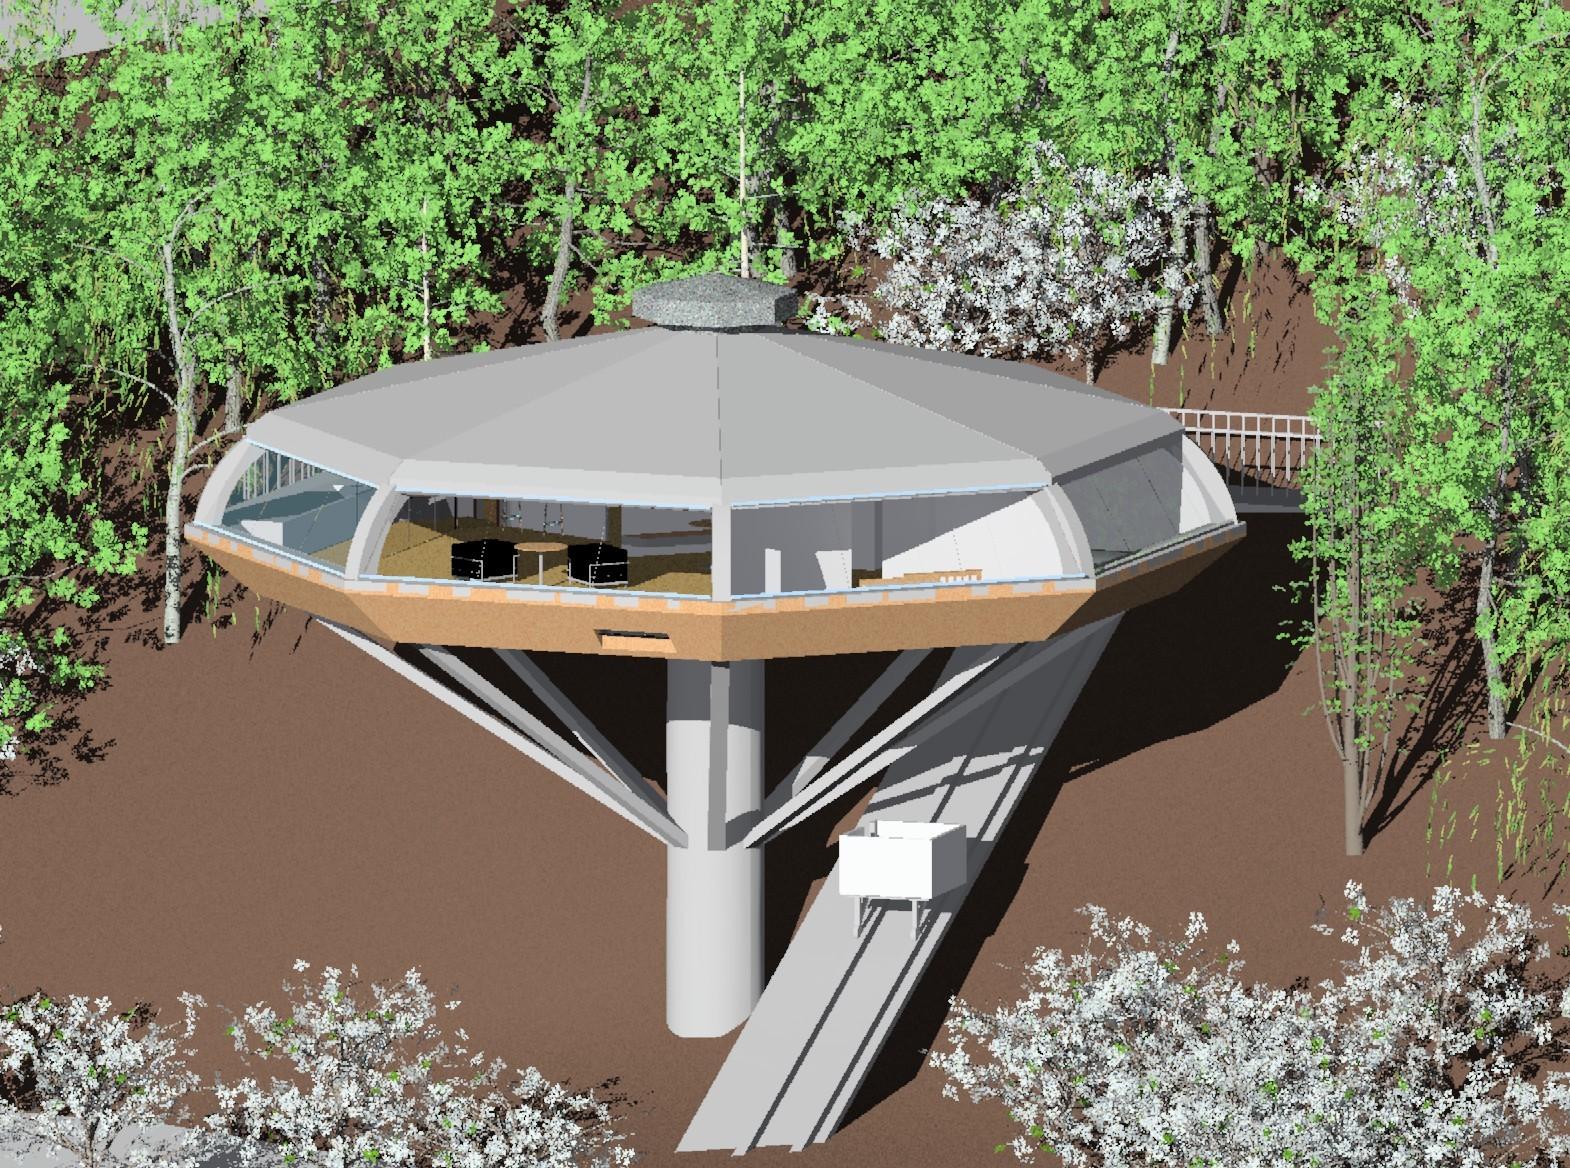 Chemosphere - Architecture Department student work